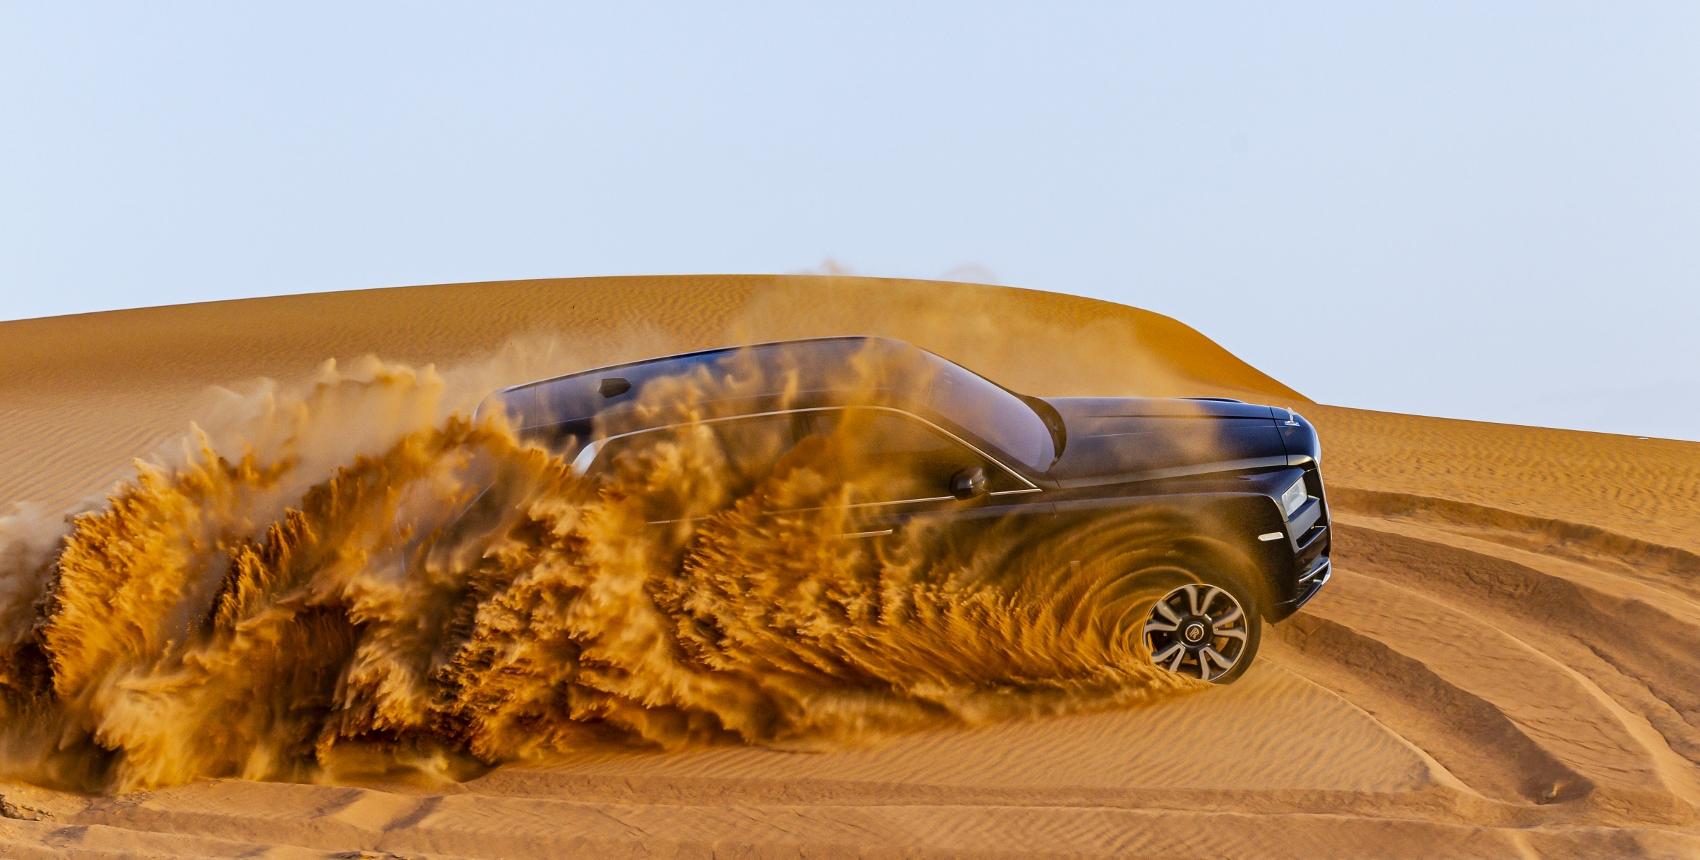 Rolls Royce Cullinan sa predviedol na púšti. Pozrite si foto aj video FFPwN3ANIC rolls-royce-cullina